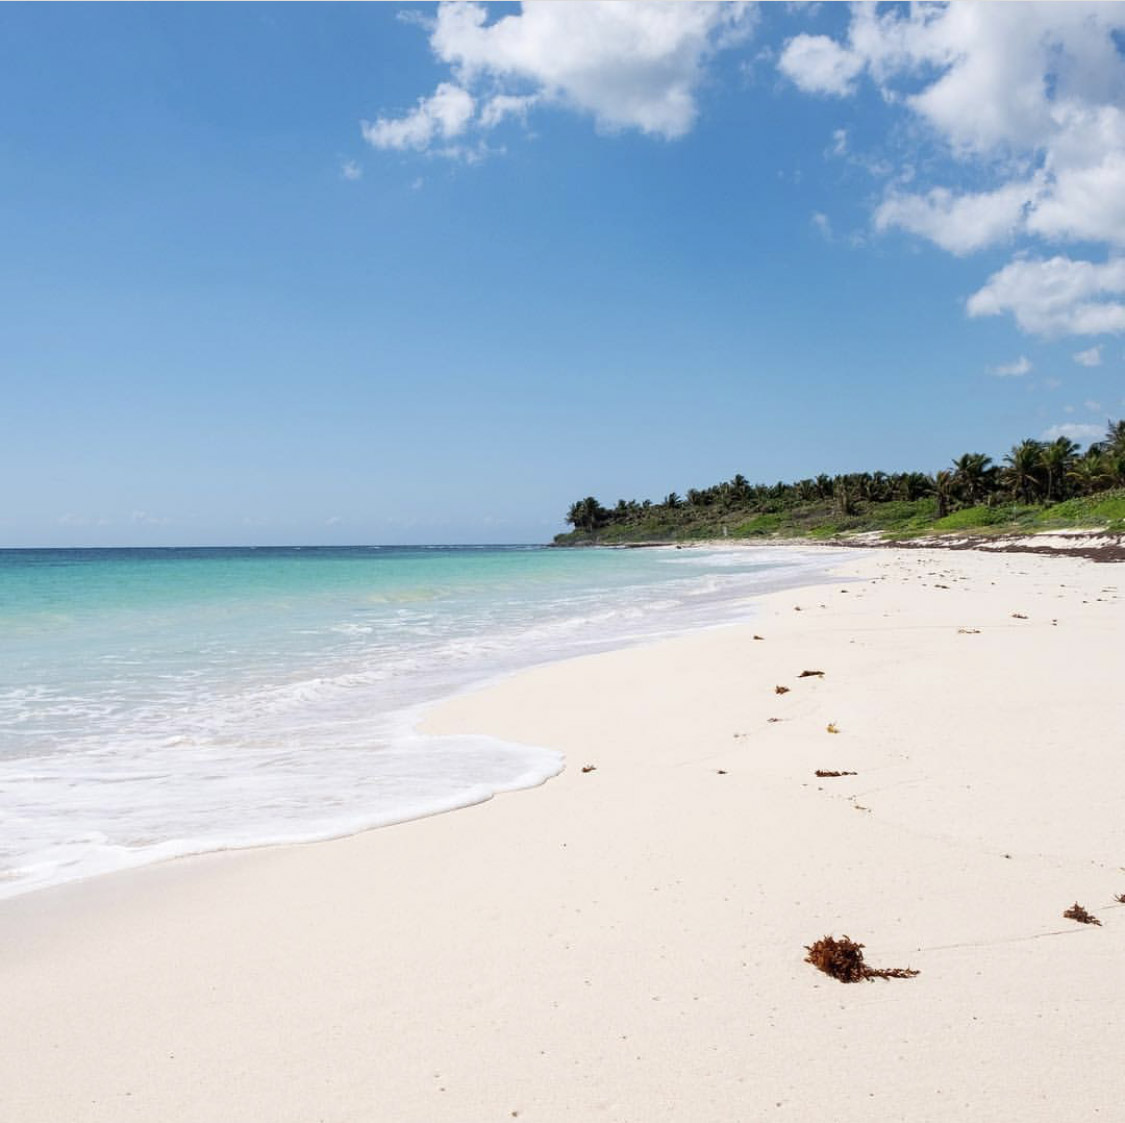 Xcacel - Viva Playa